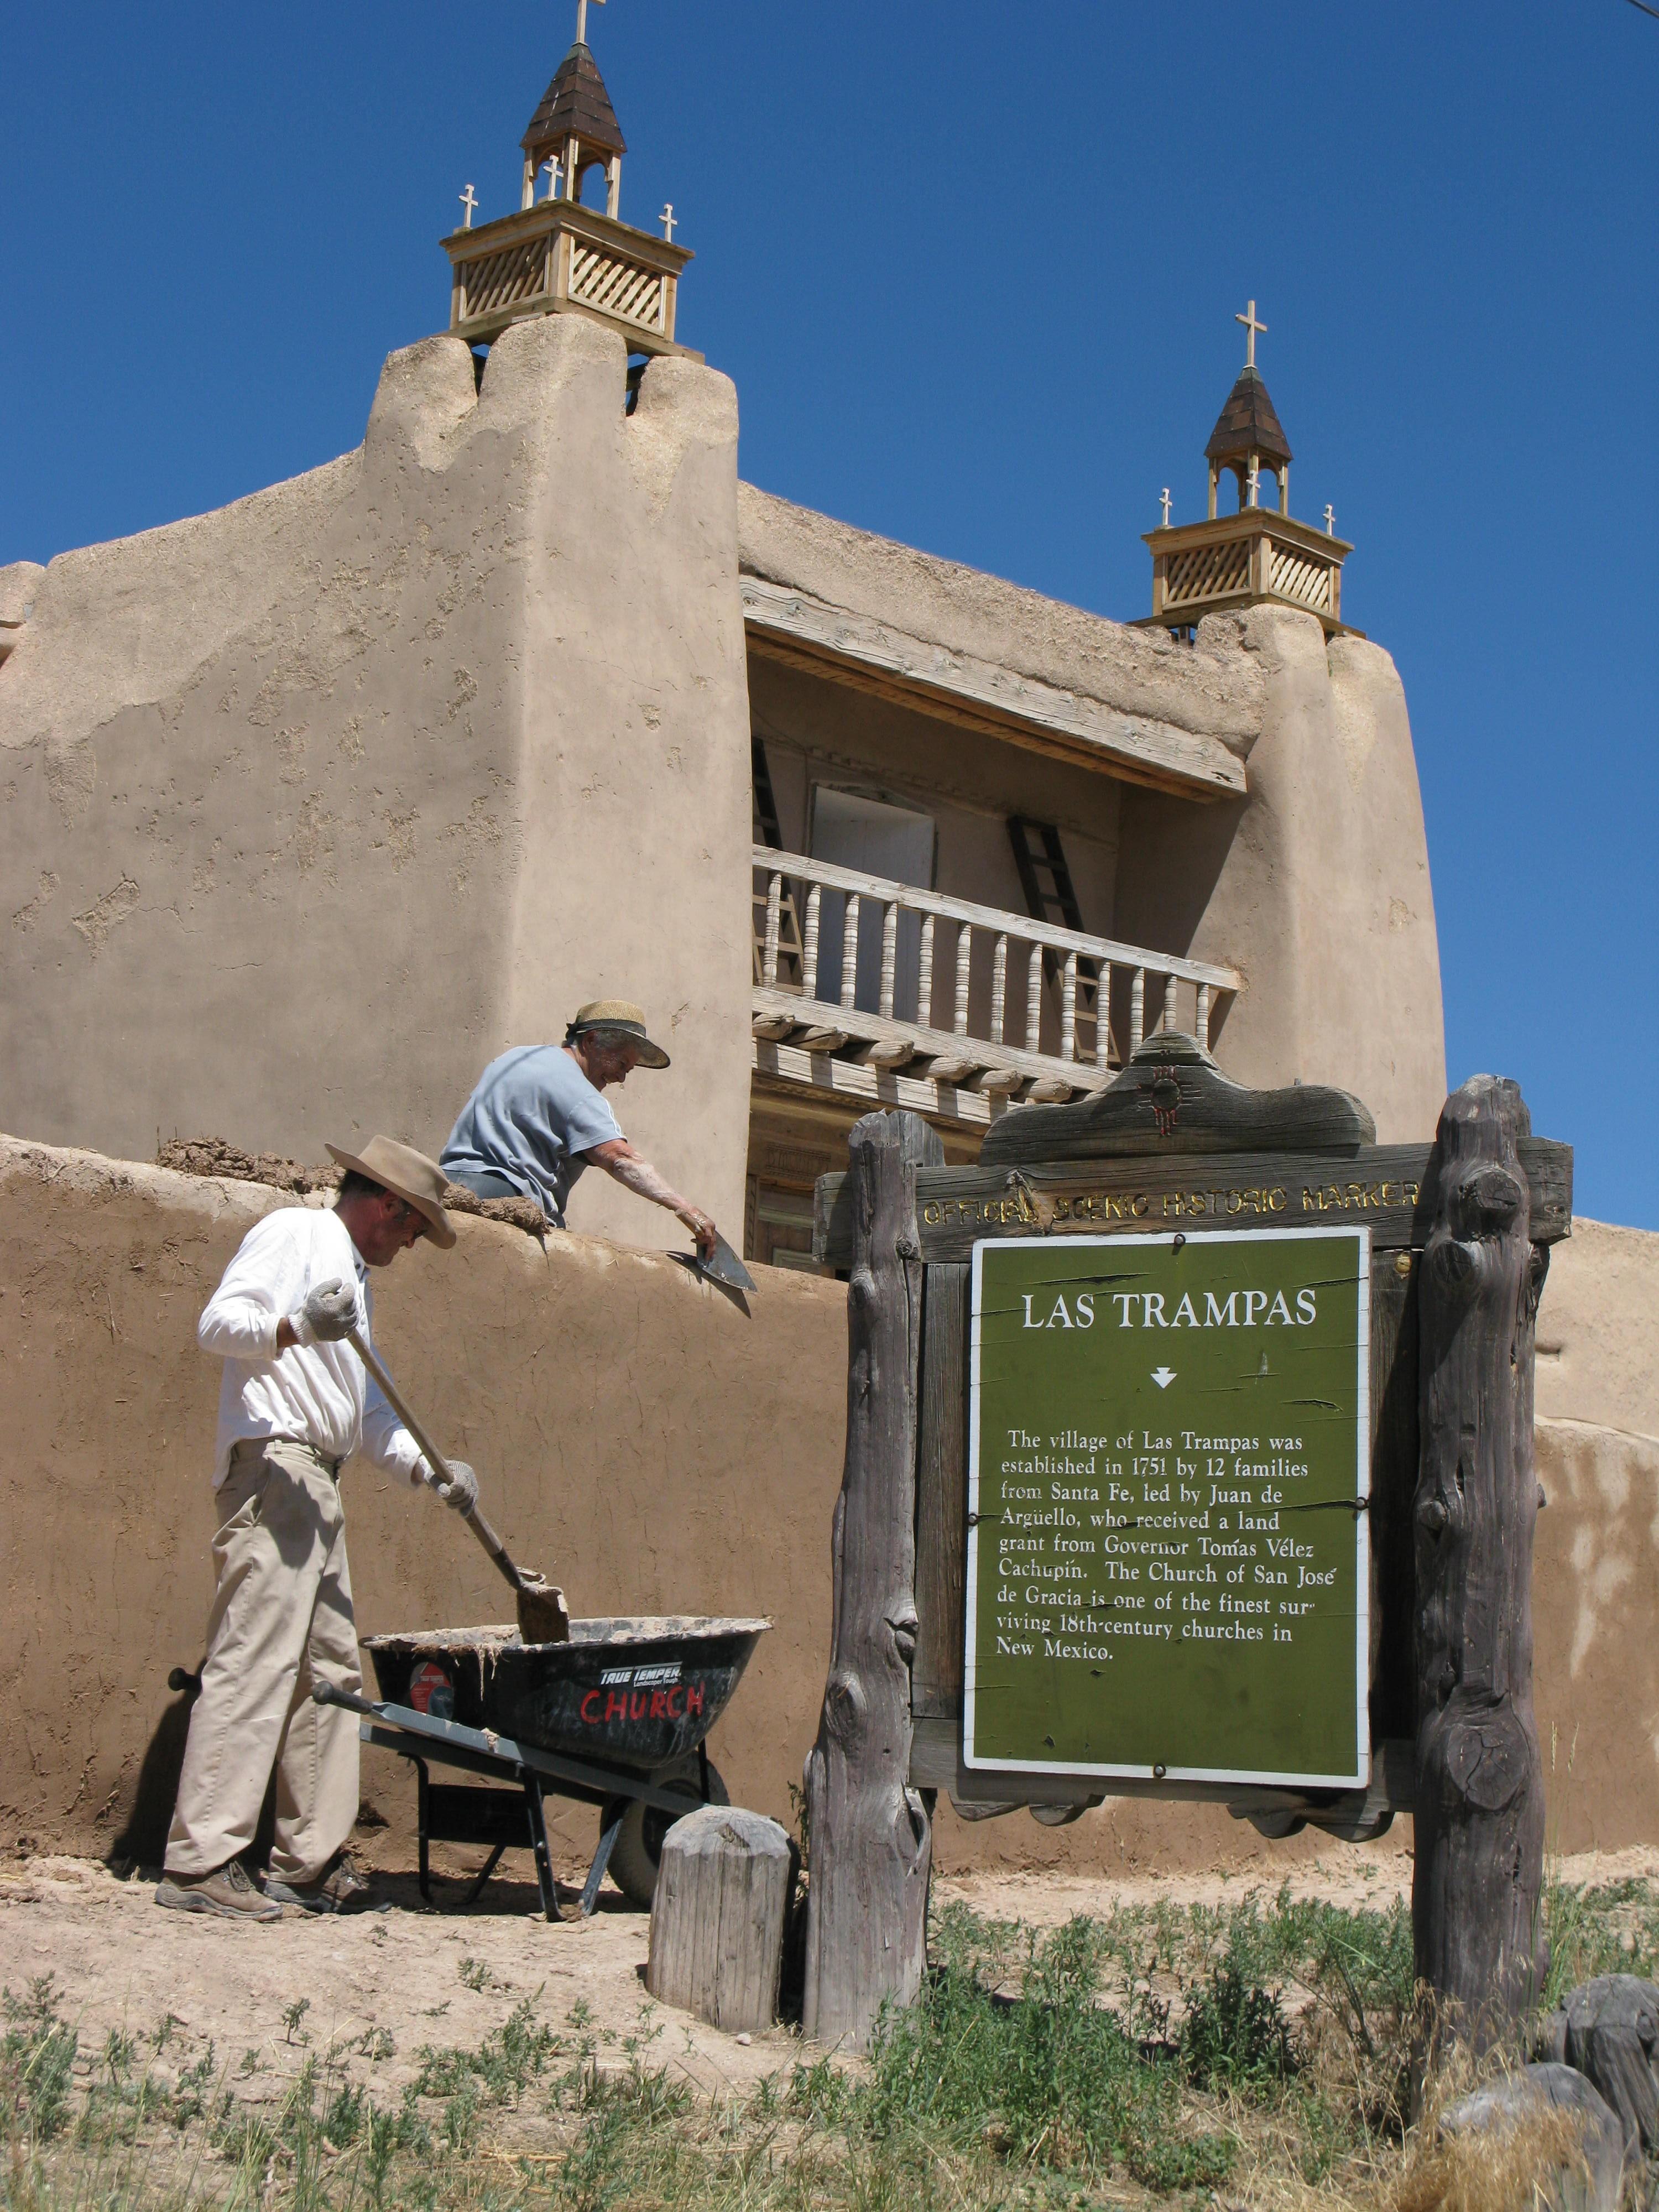 Las Trampas Mission Church